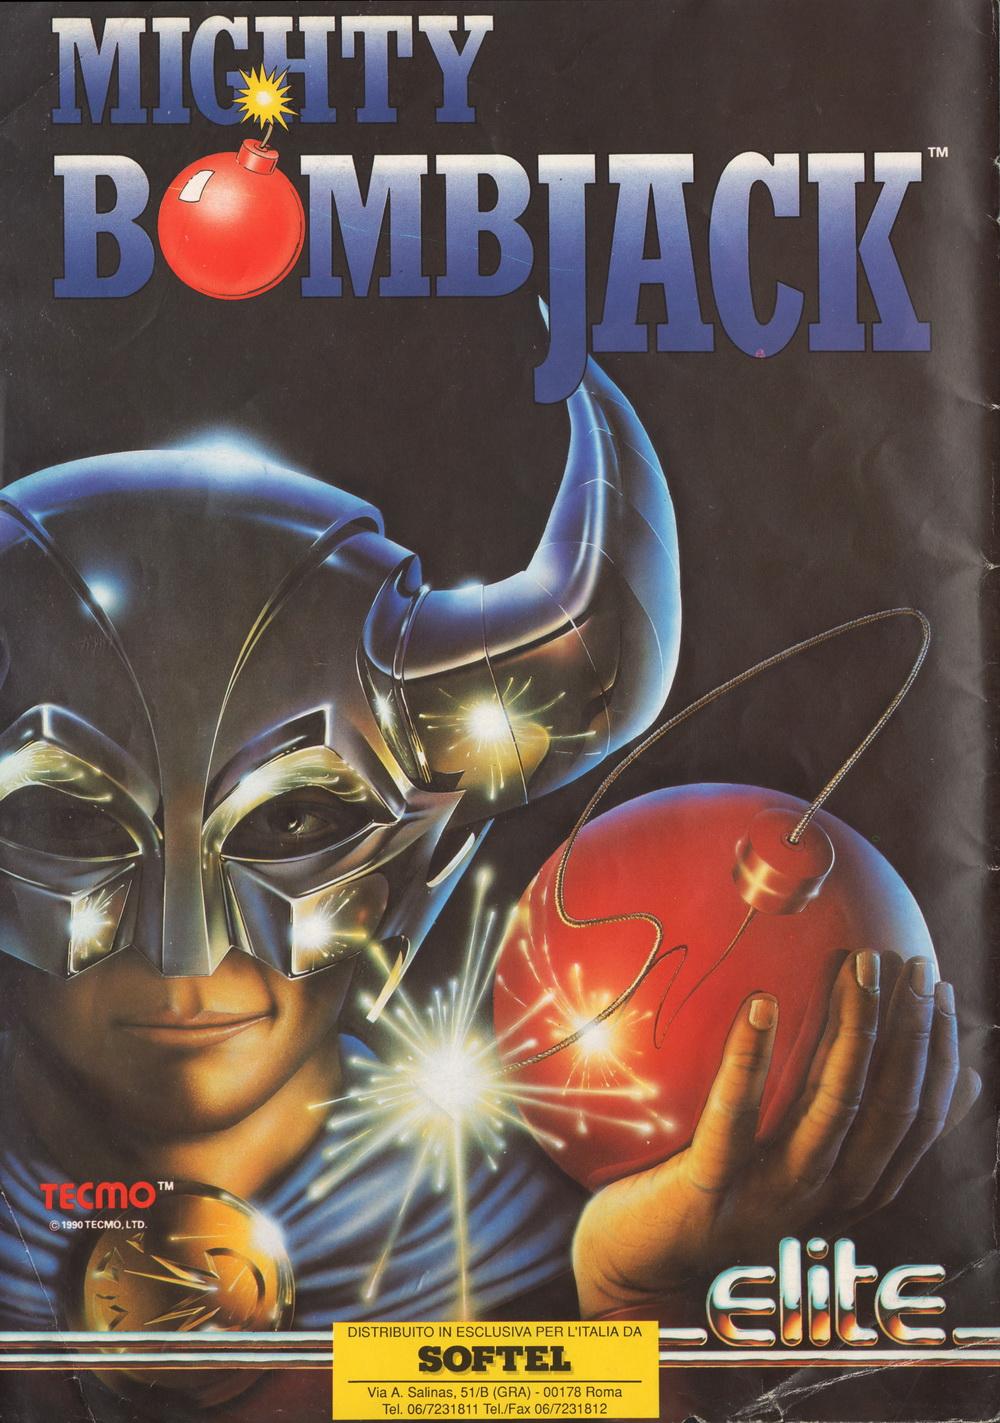 free mighty bomb jack